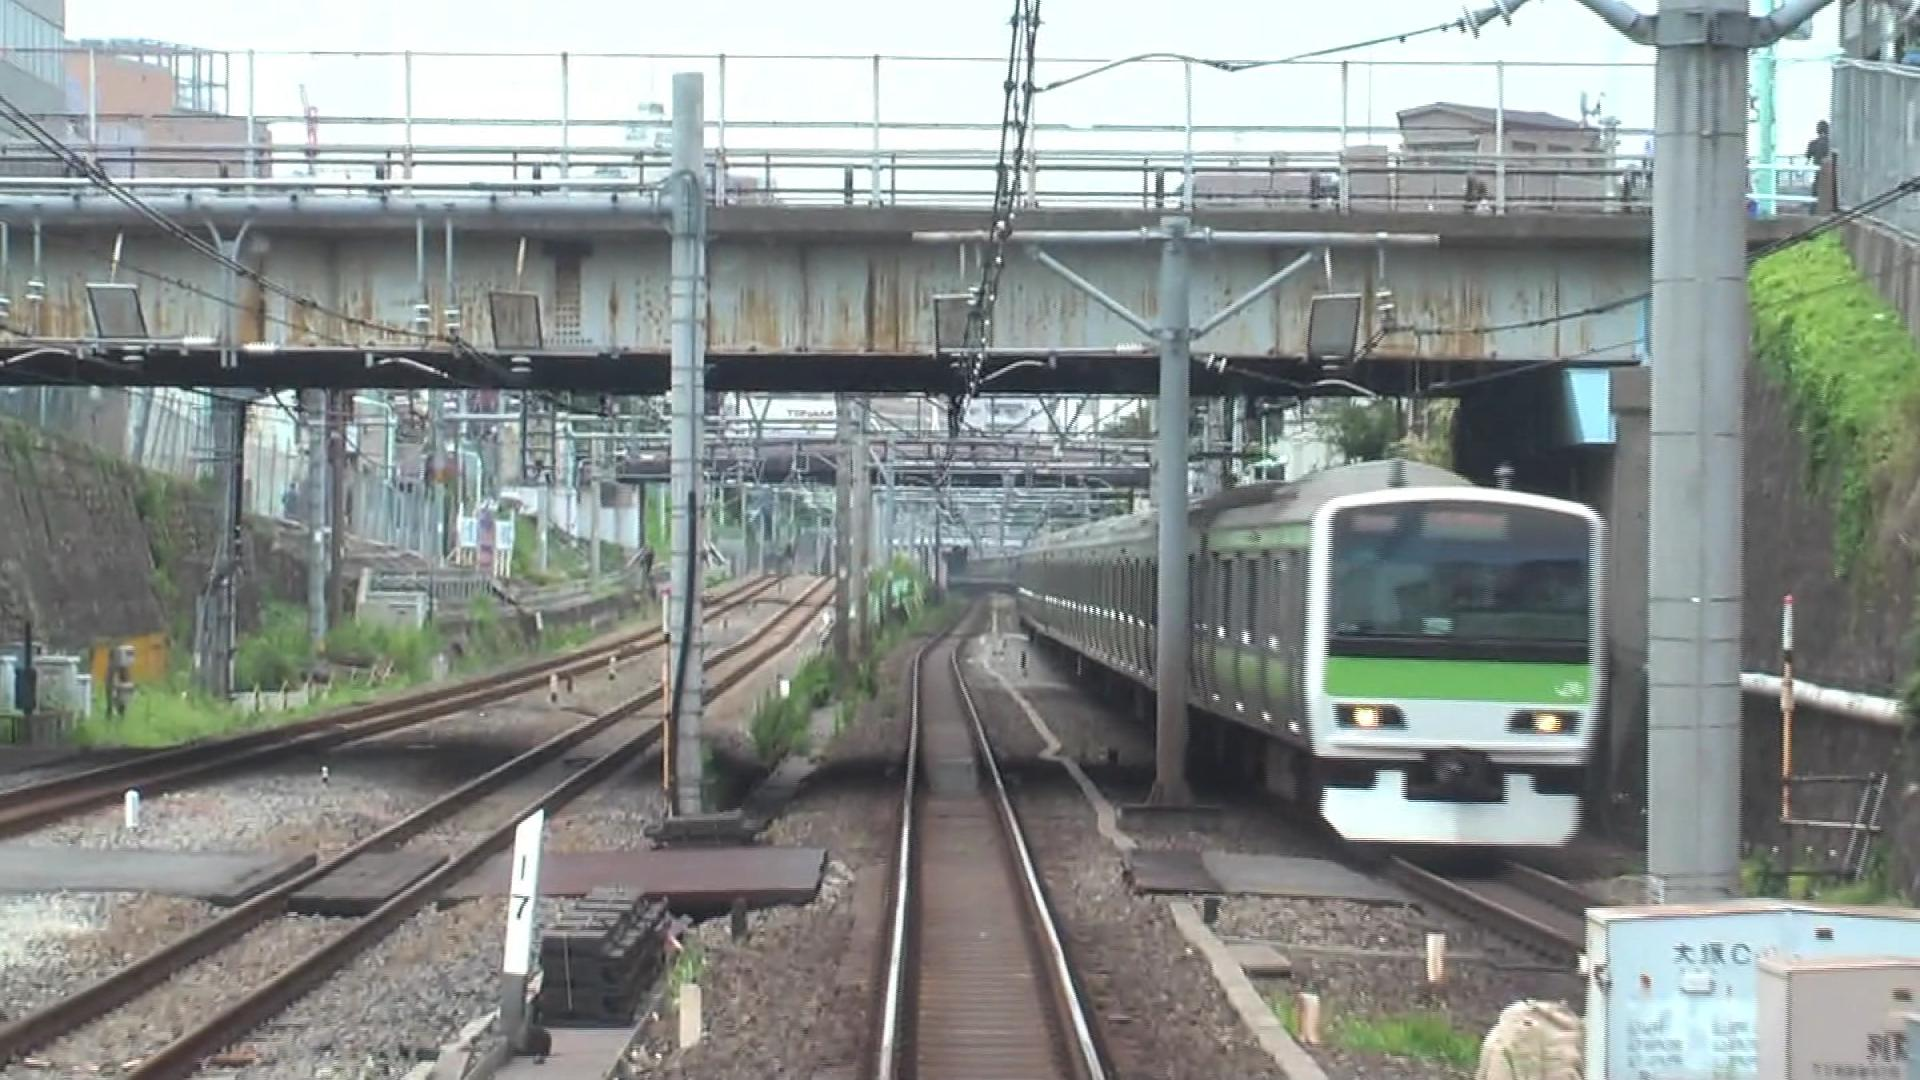 Yamanotetrainline2009.ogv